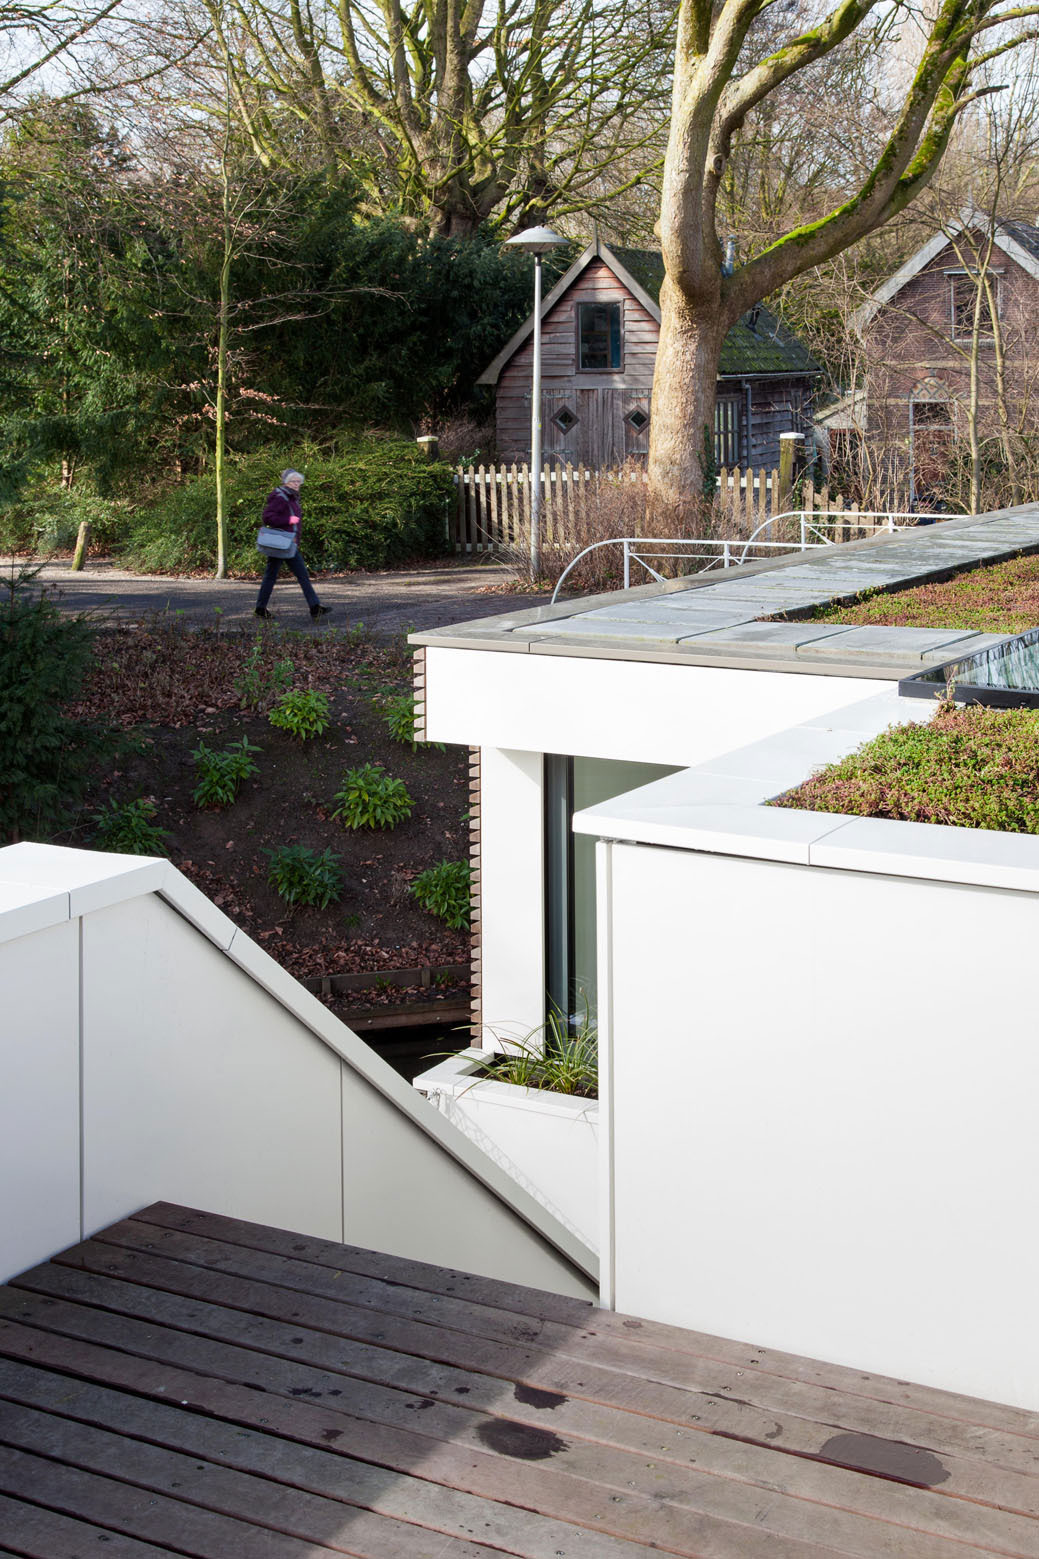 ParkrArk by BYTR architecten (9)